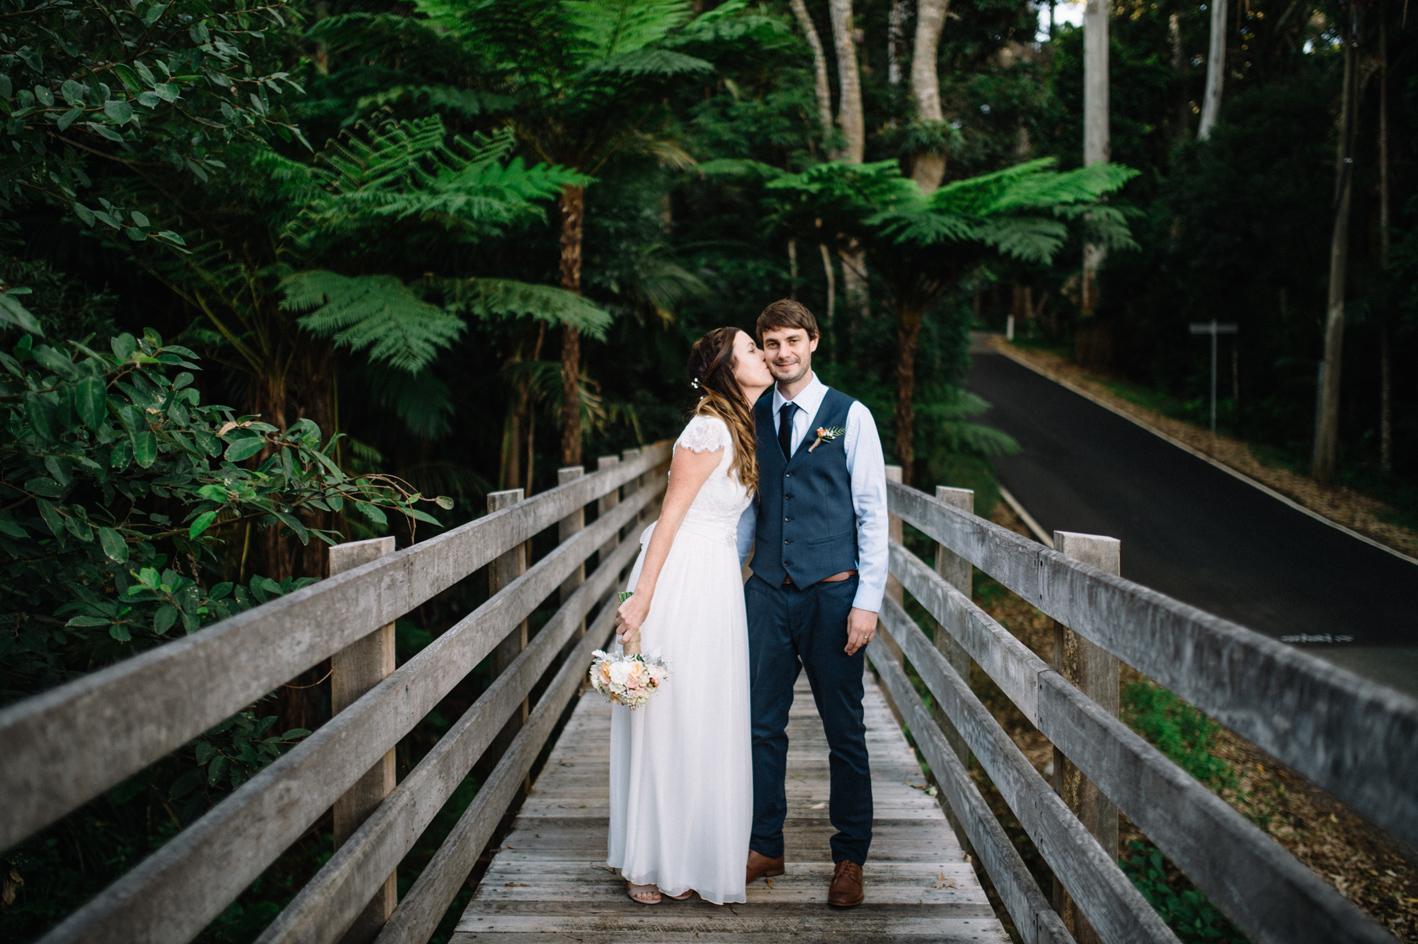 048-michelle-reagan-mount-tamborine-wedding-sophie-baker-photography